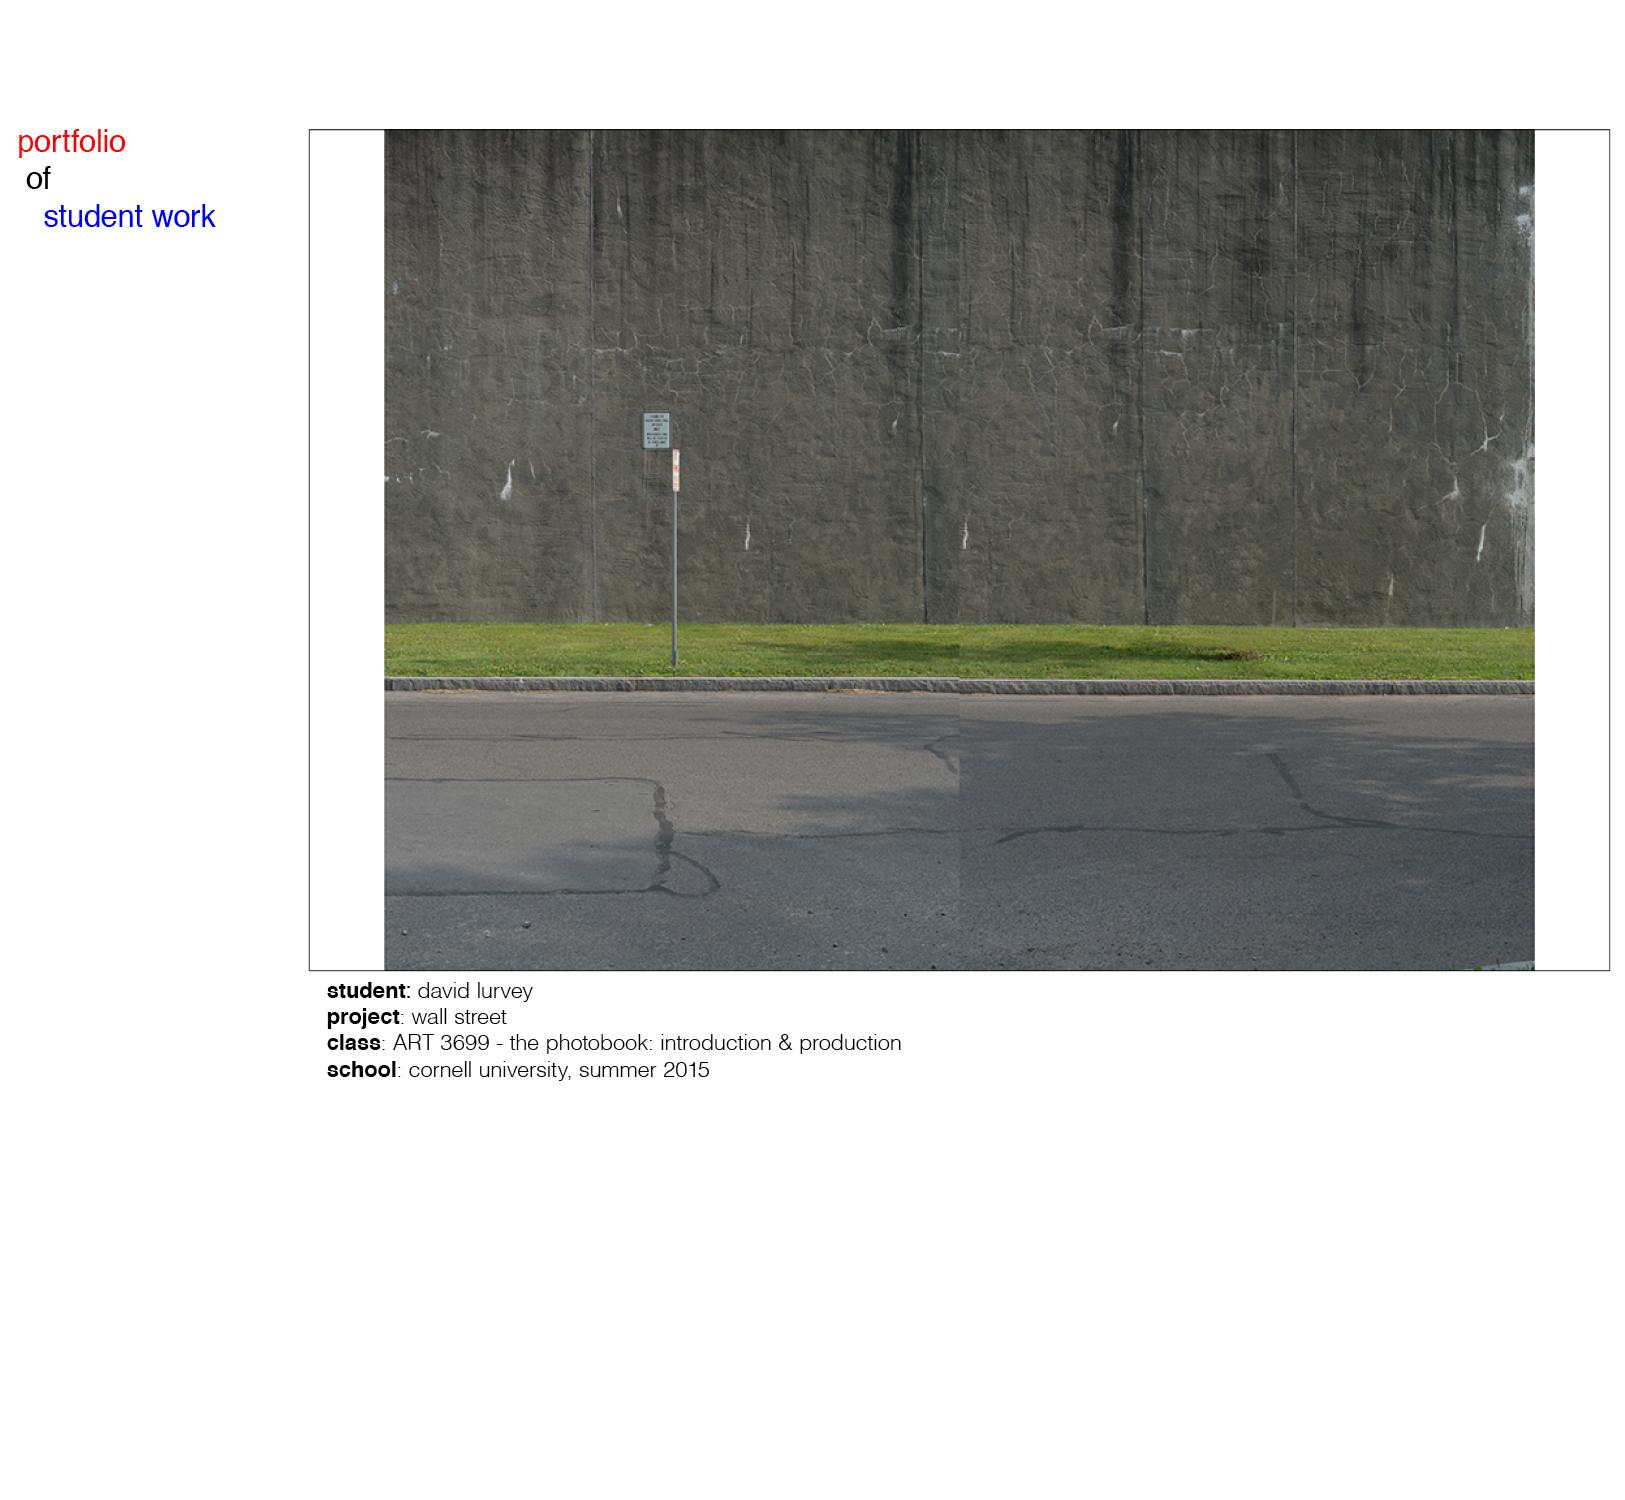 wall_street_005.jpg